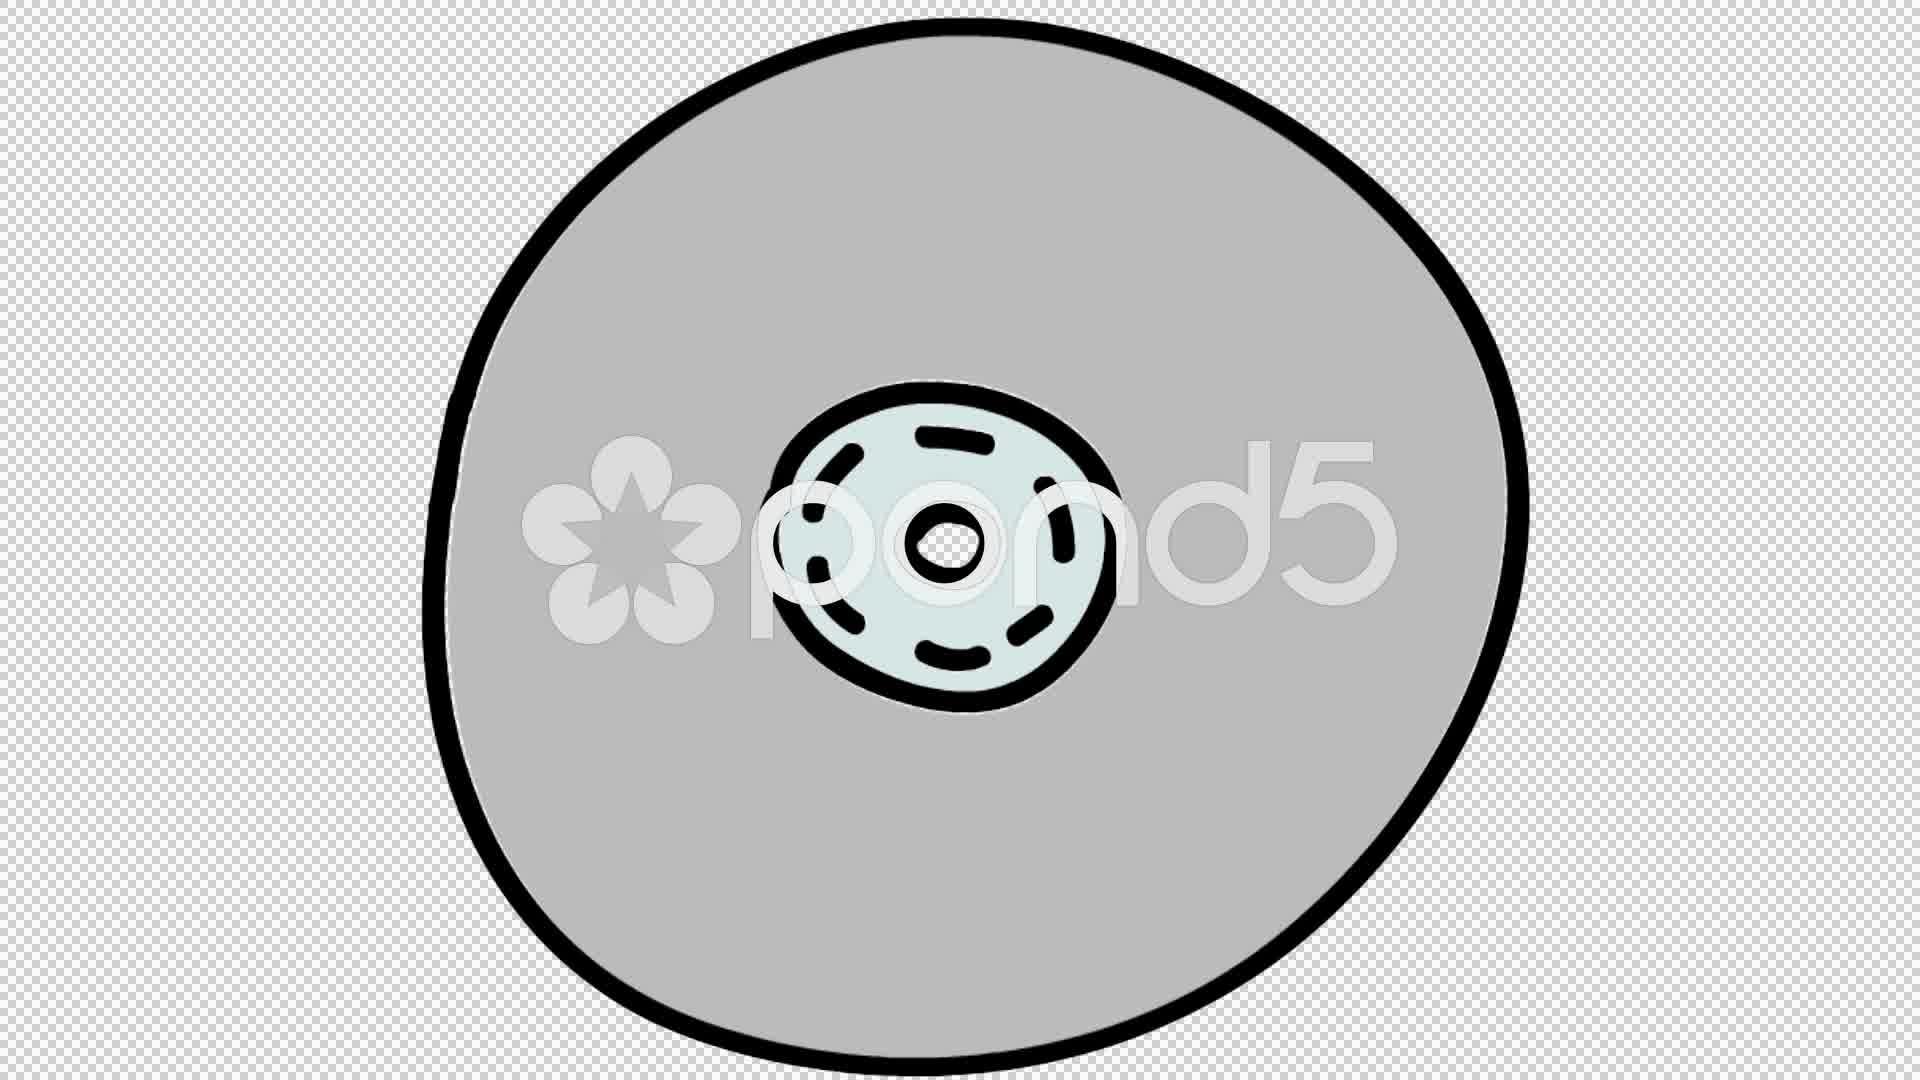 1920x1080 Computer Cd Dvd Line Drawing Illustration Animation